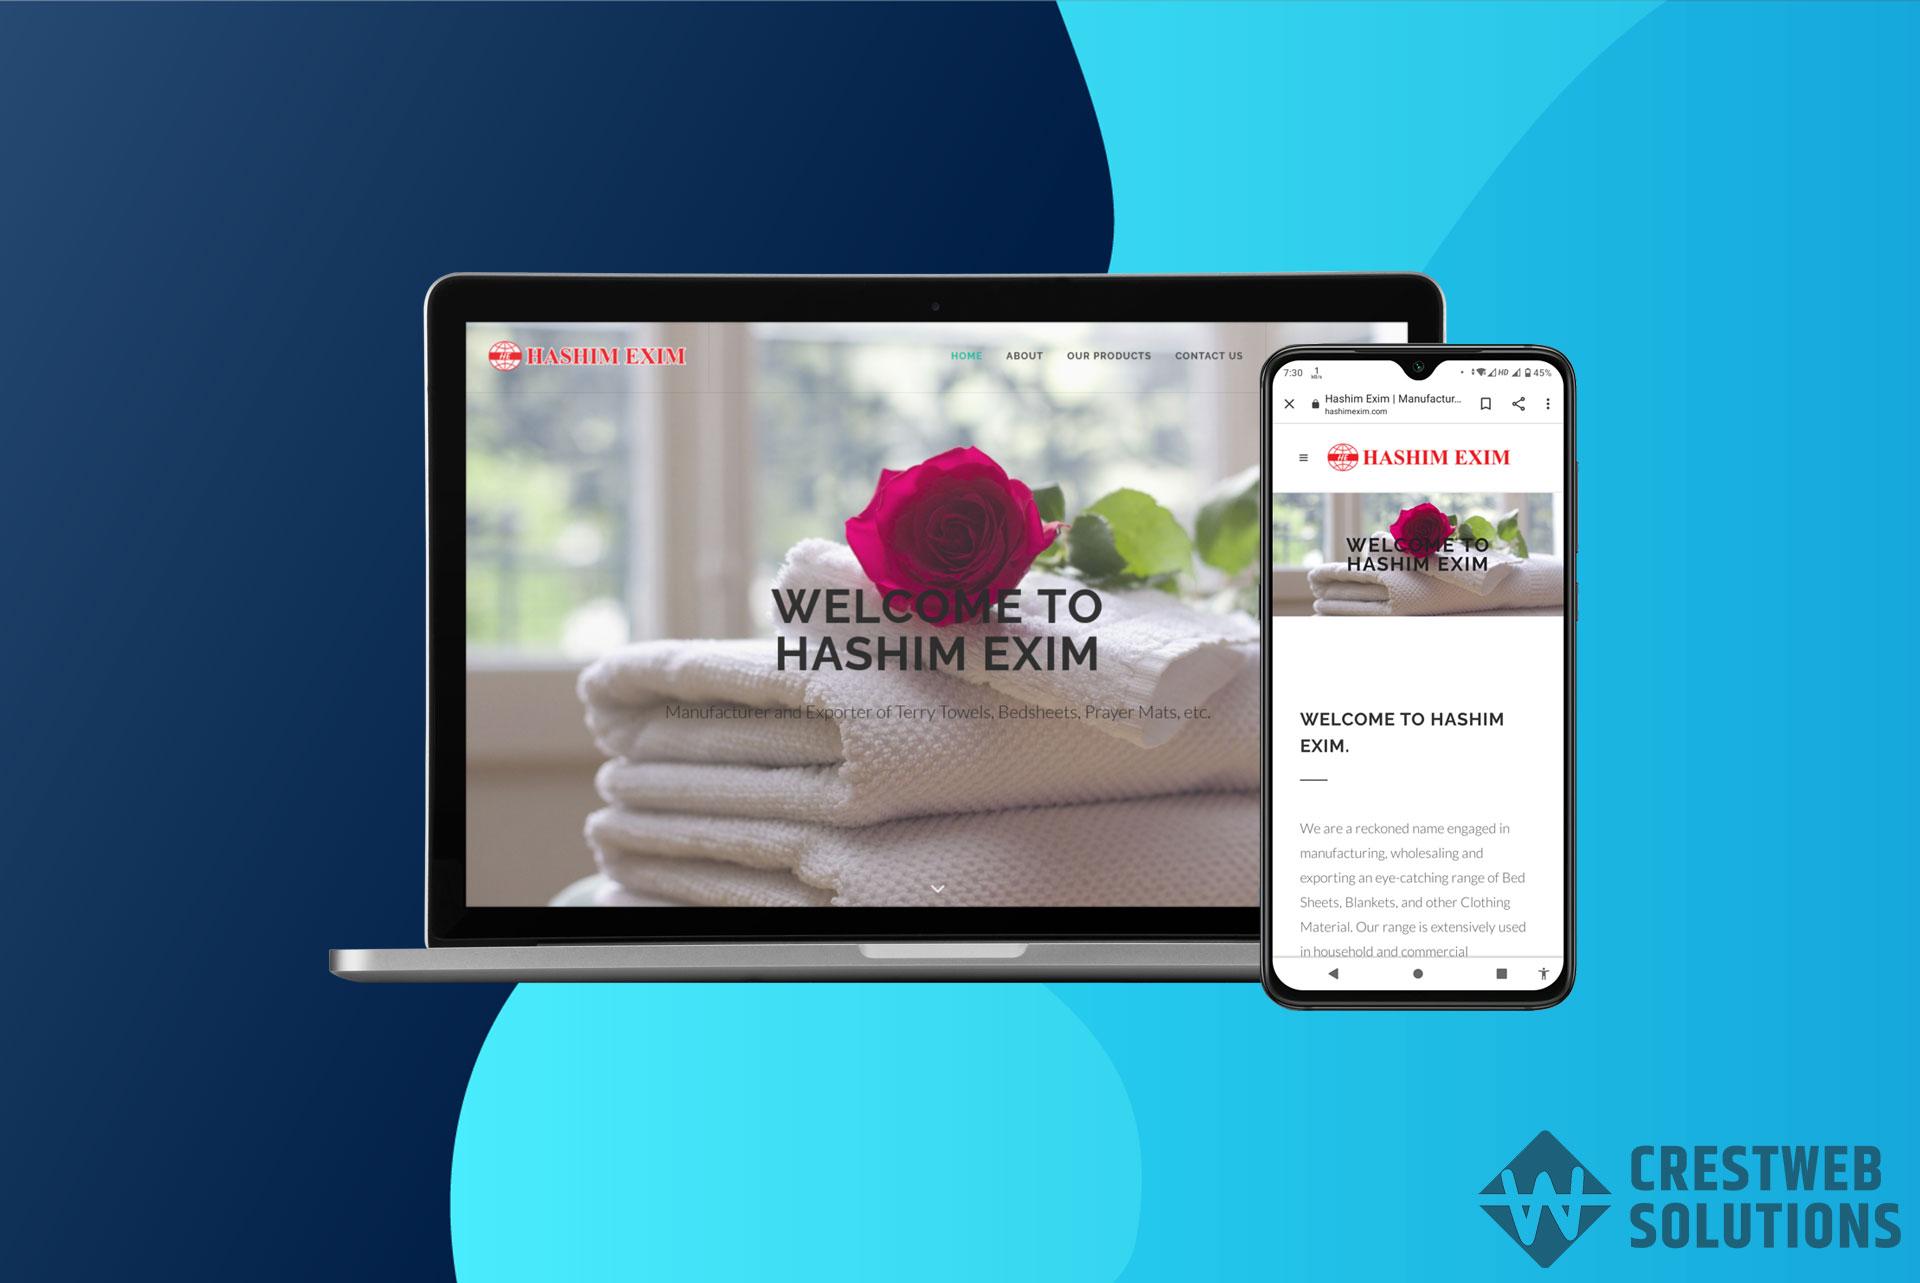 hashimexim responsive website in mumbai ecommerce crestweb solutions